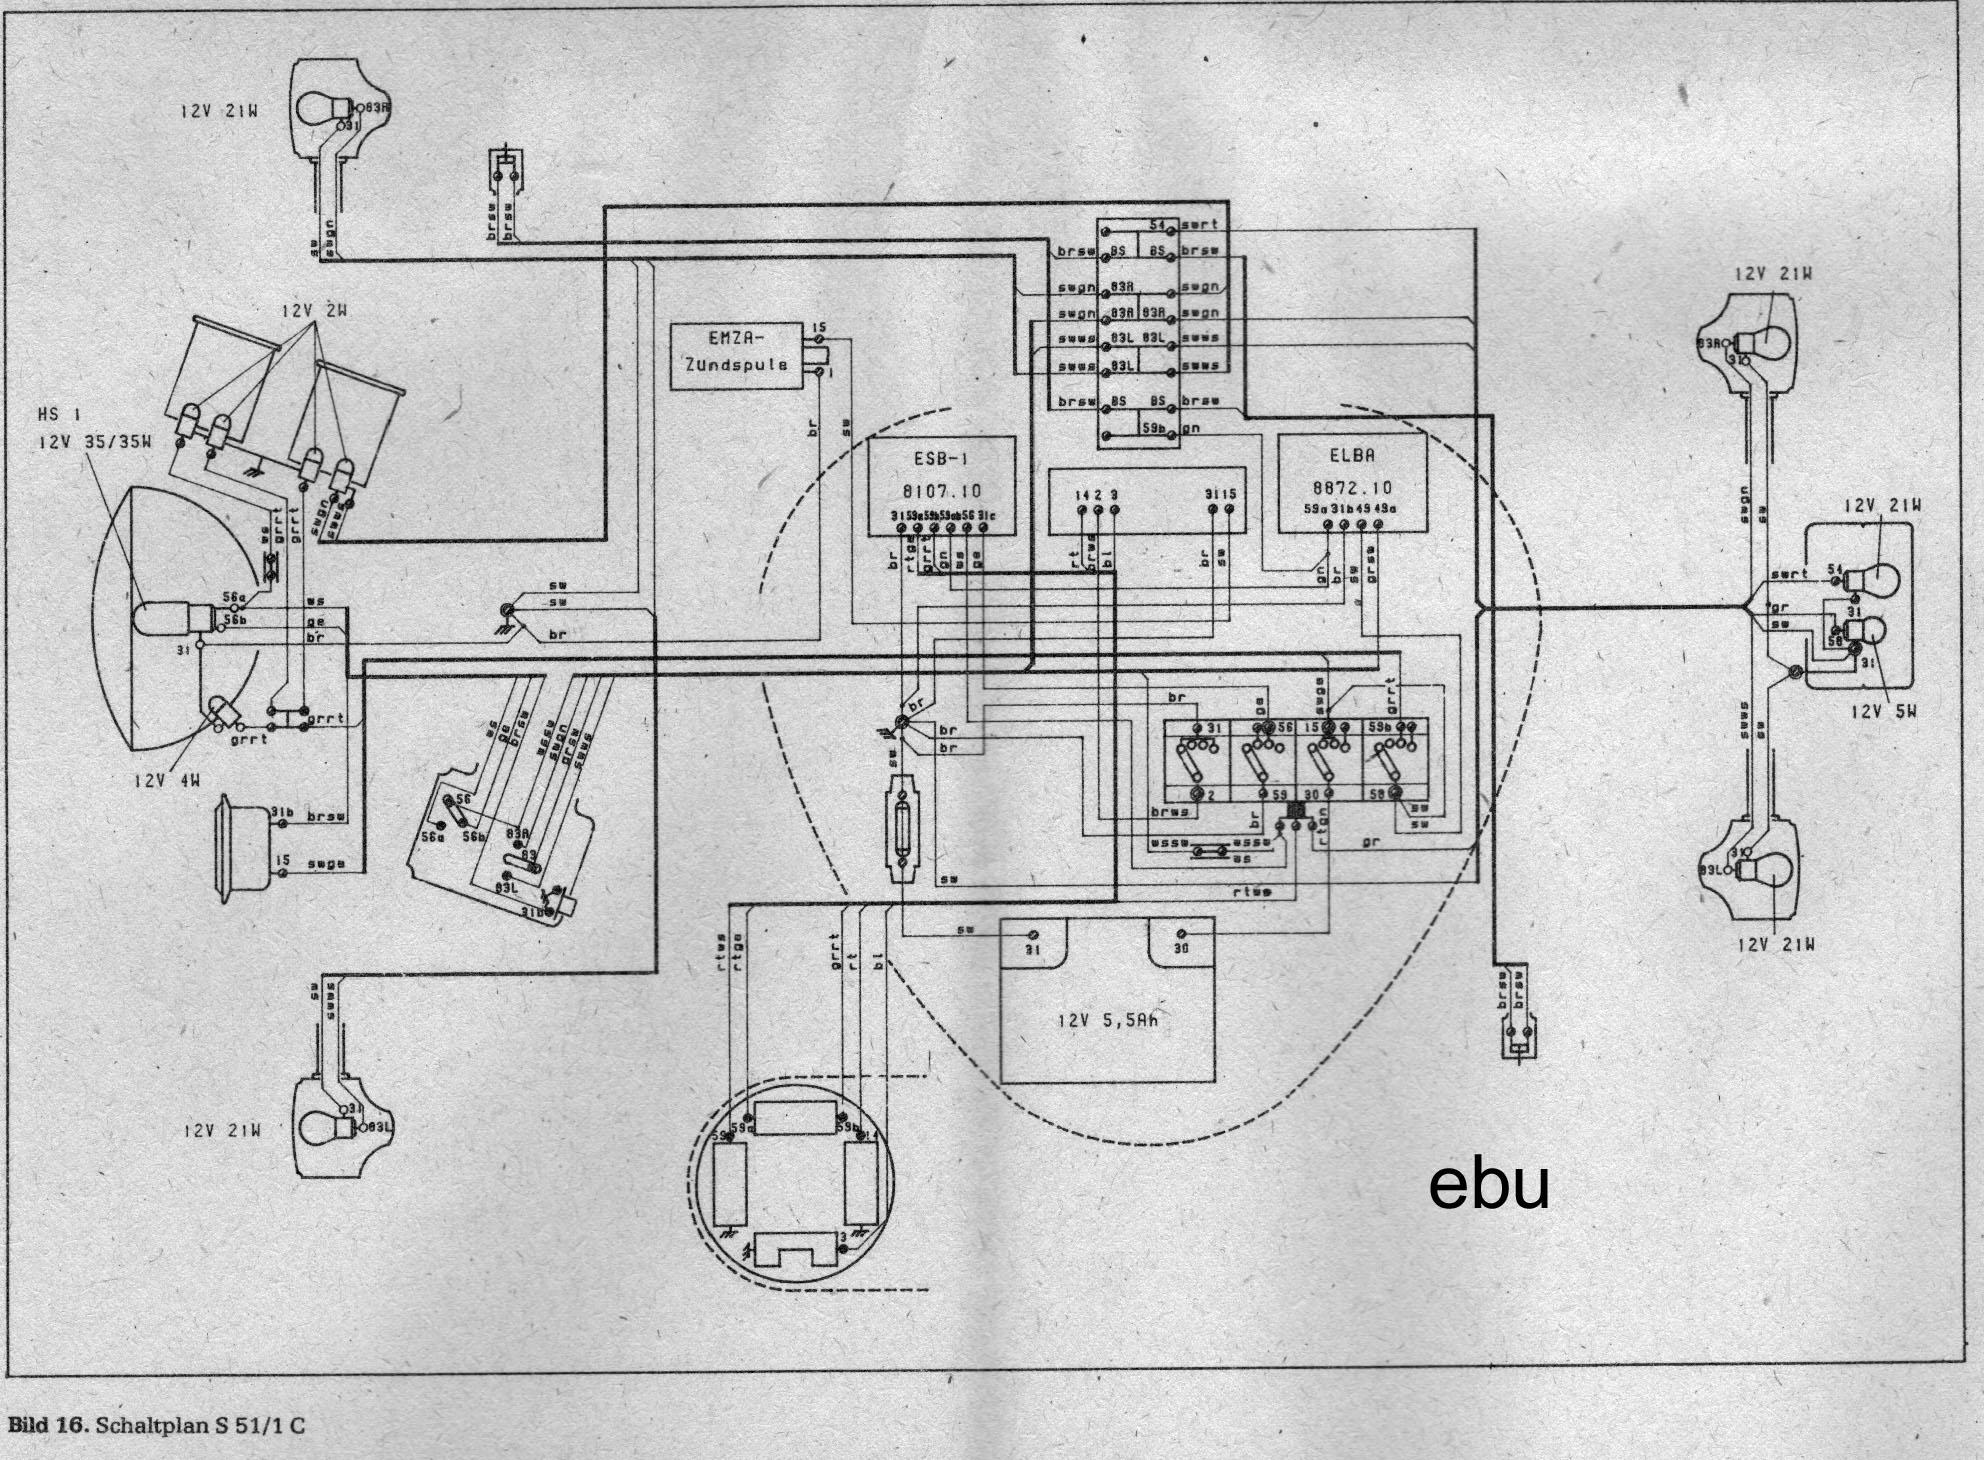 Schaltplan Simson S51 12v - Wiring Diagram